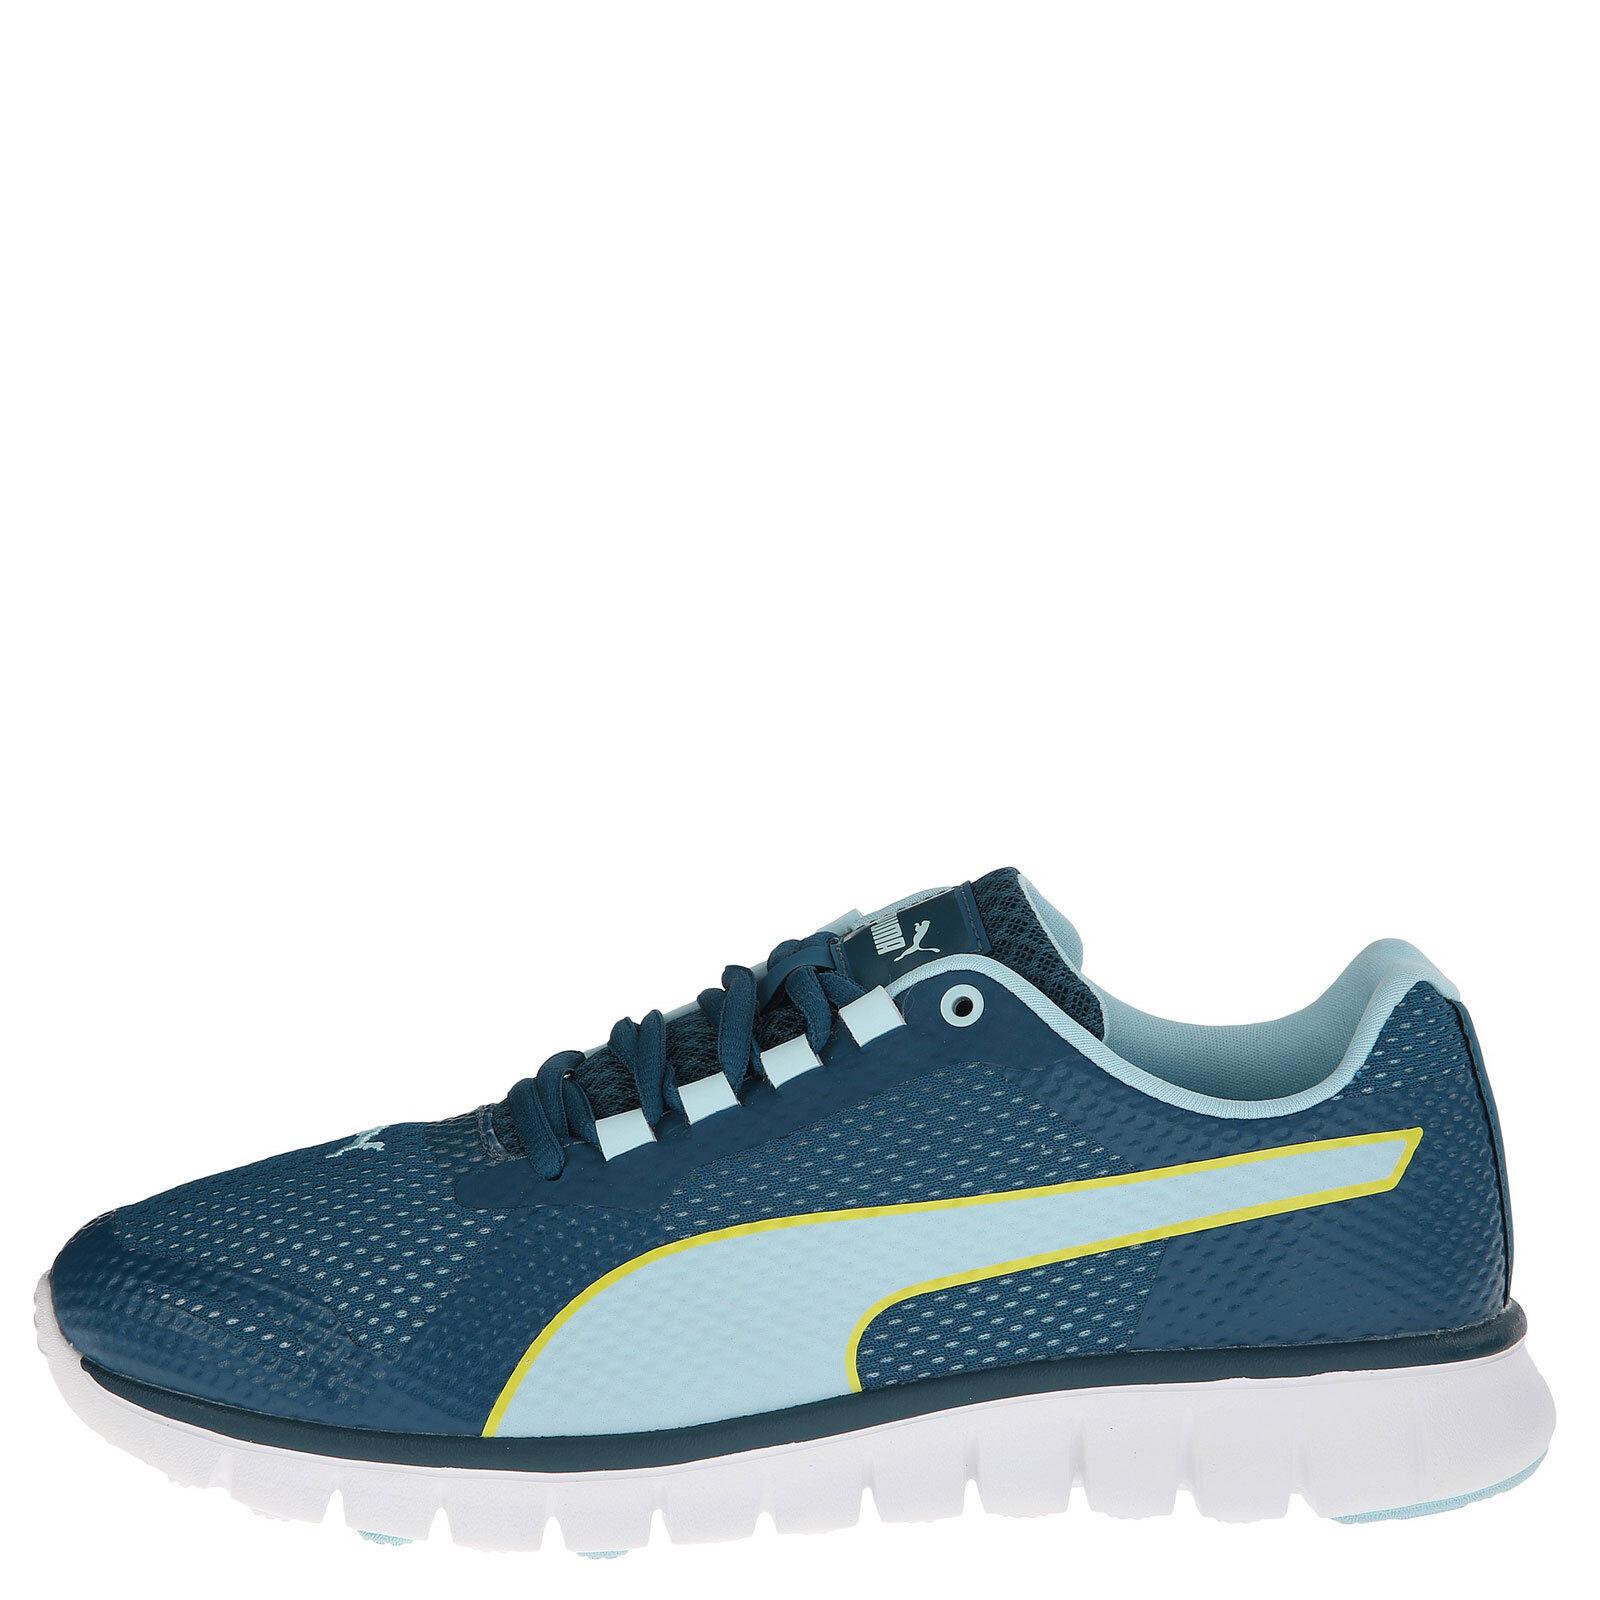 PUMA Blur  Blue Coral Women's Running Shoes 188406-01 Seasonal price cuts, discount benefits